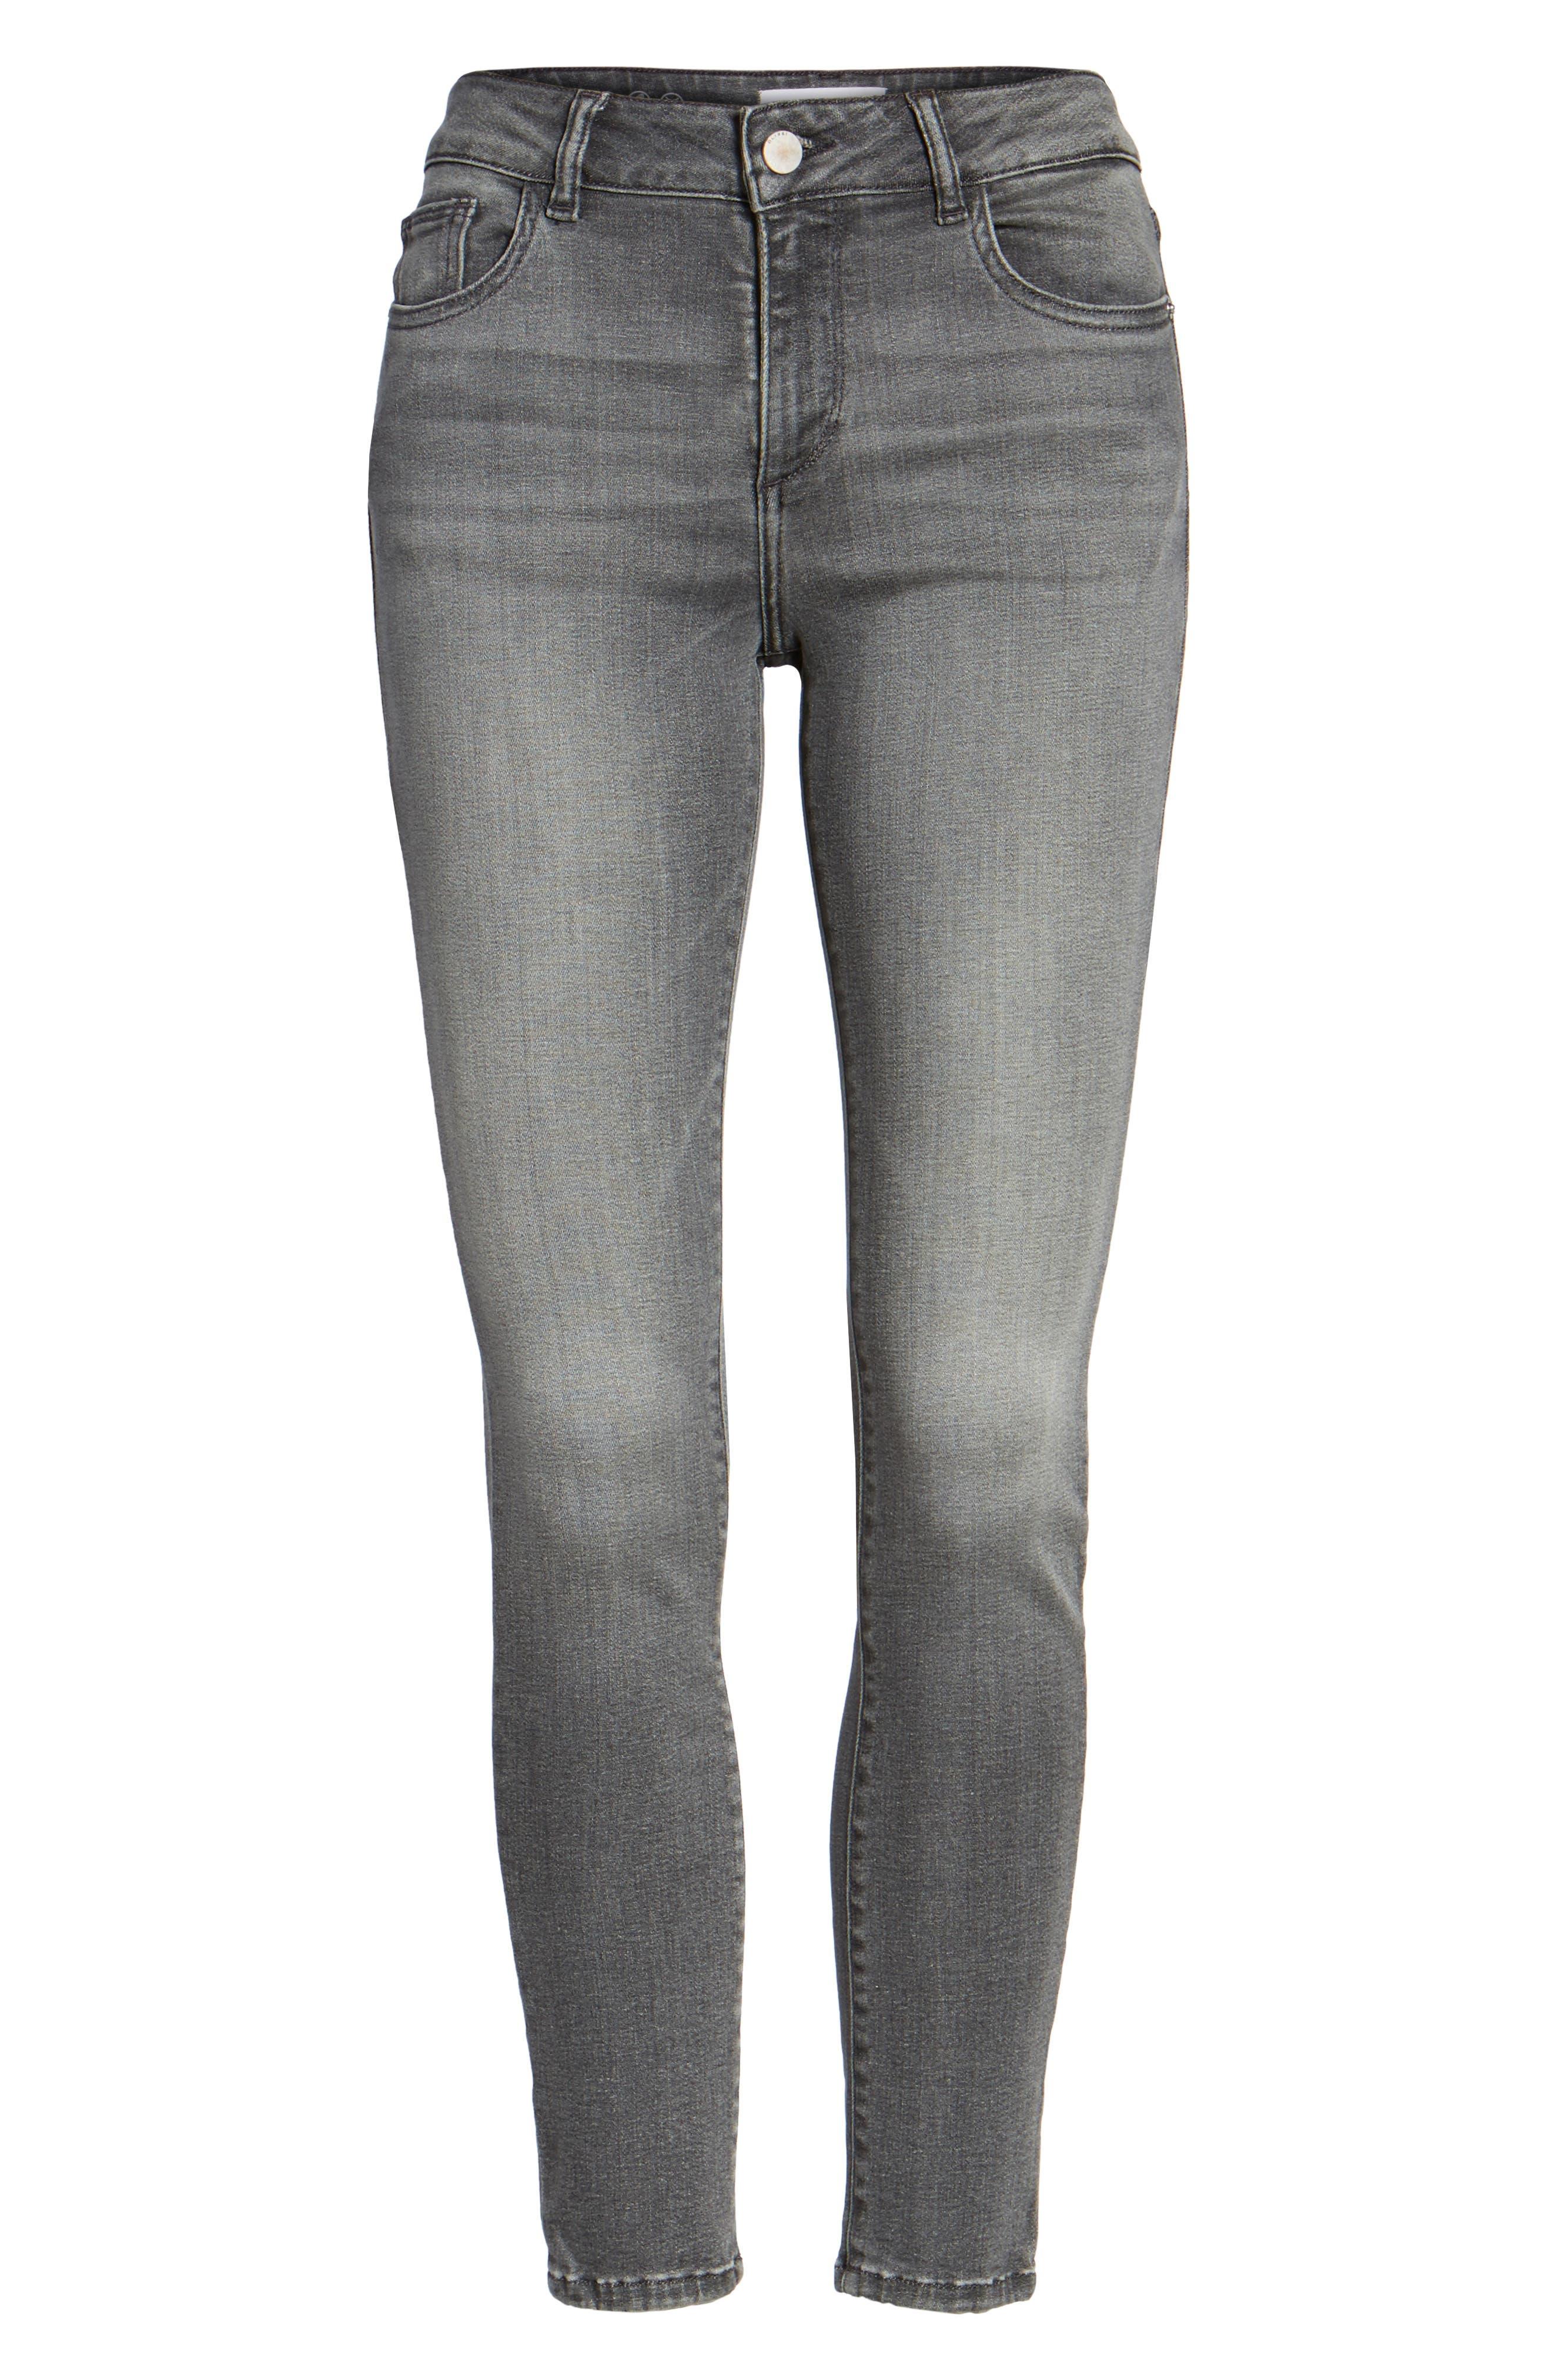 Farrow High Waist Instaslim Skinny Jeans,                             Alternate thumbnail 6, color,                             020